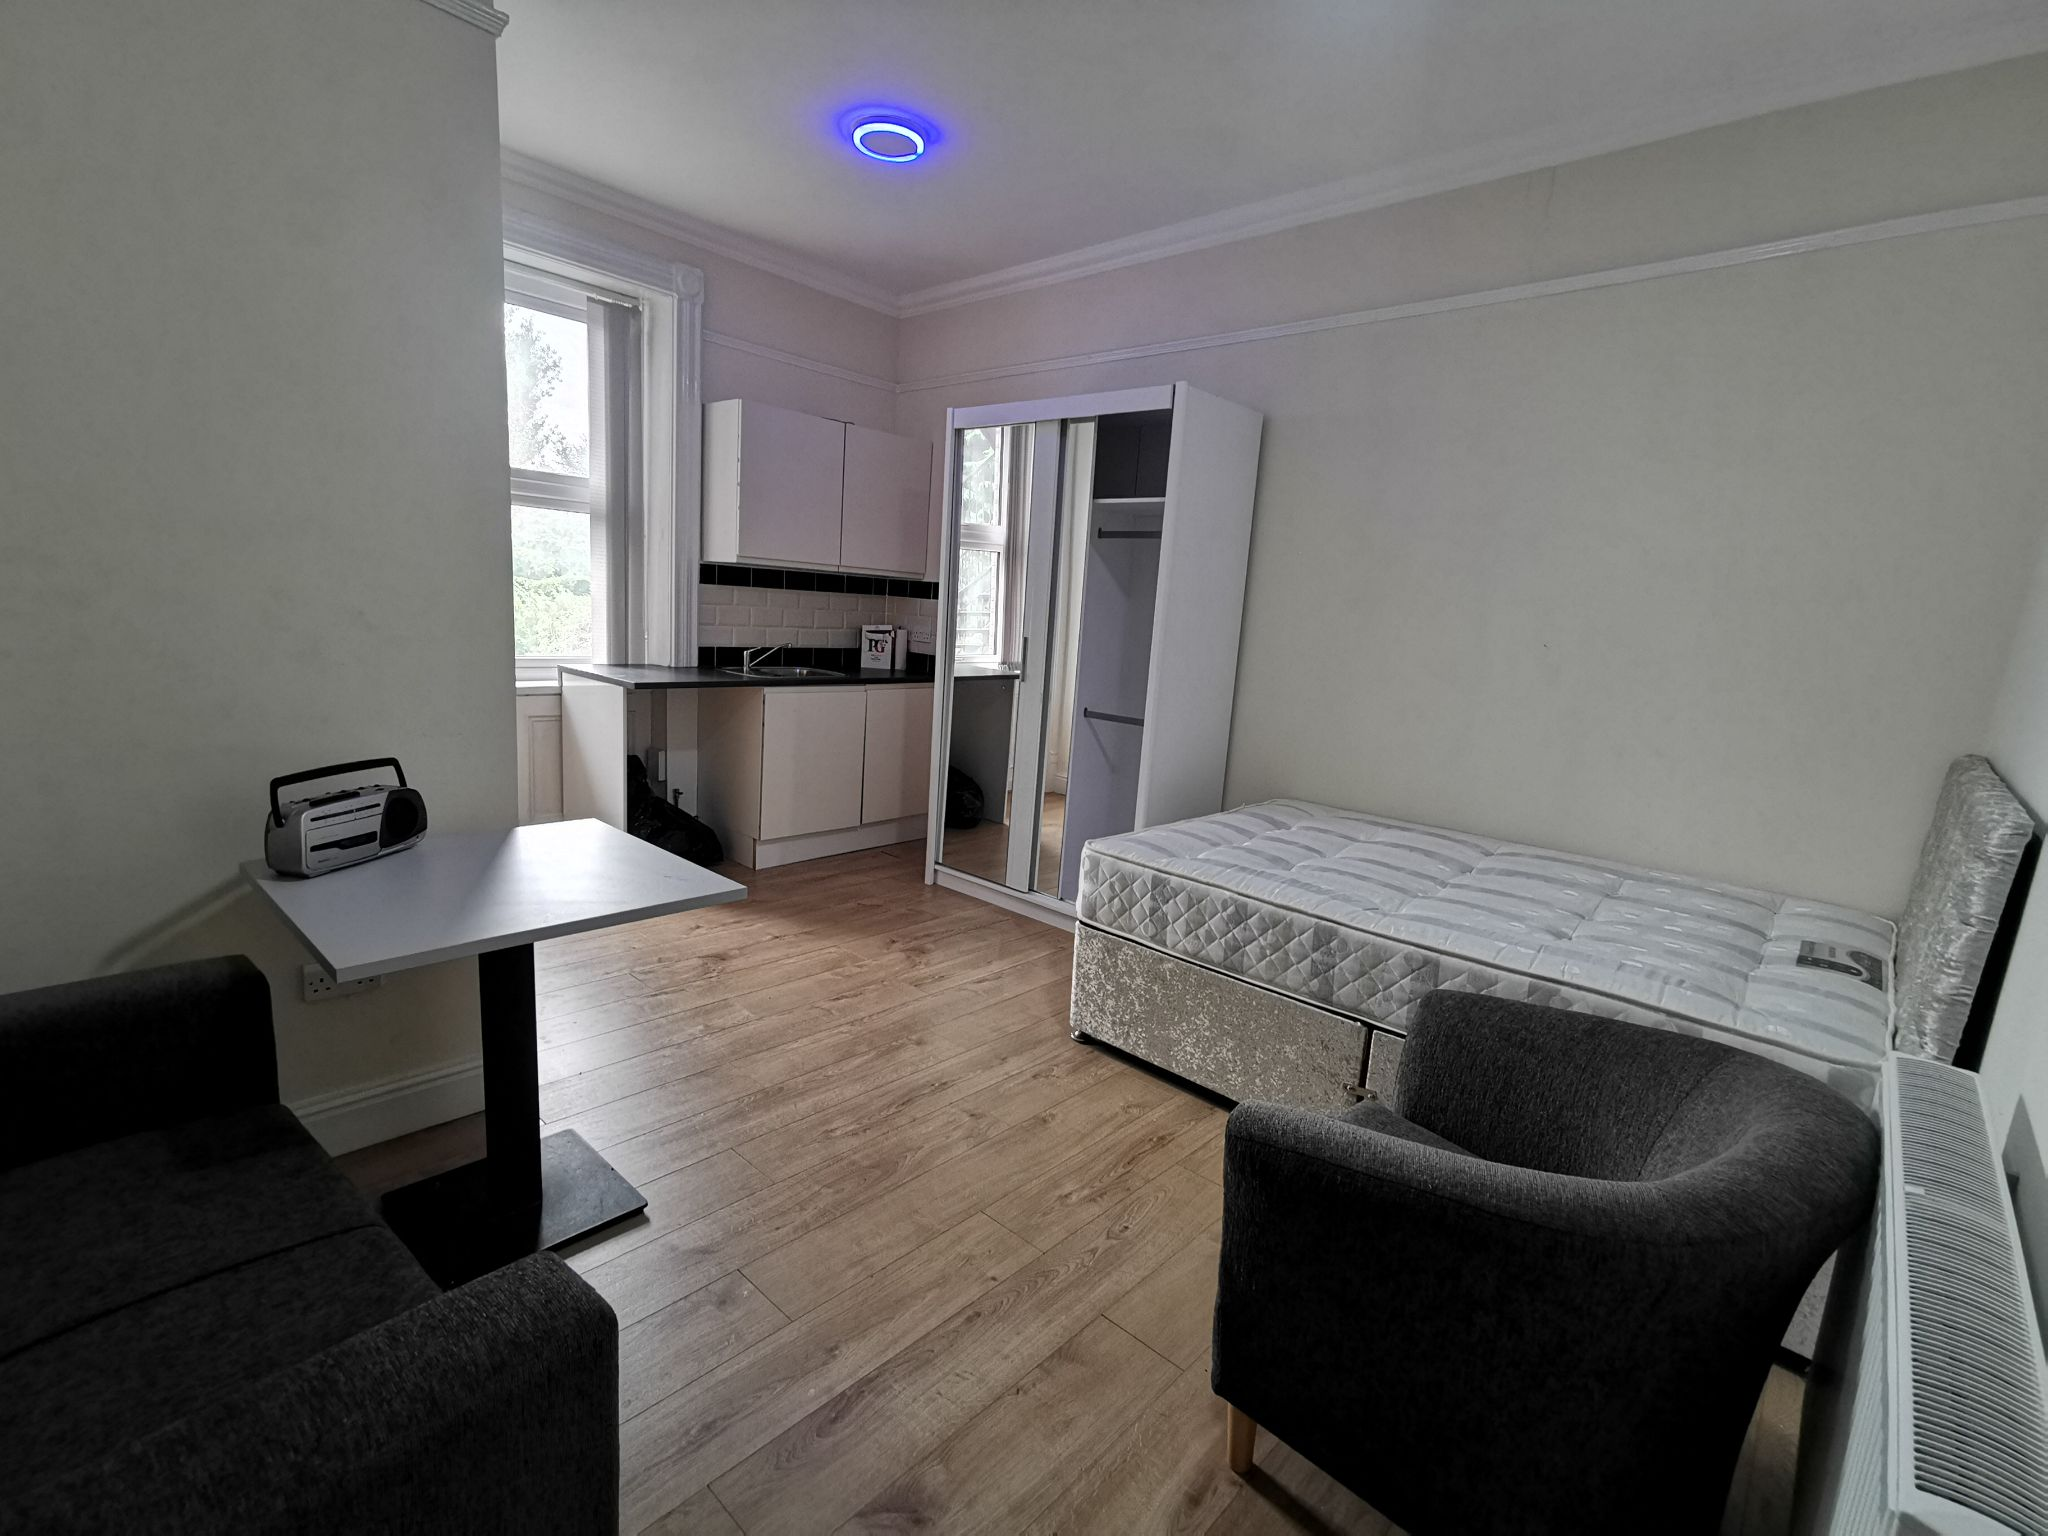 1 bedroom bedsit flat/apartment in Bradford - Photograph 3.